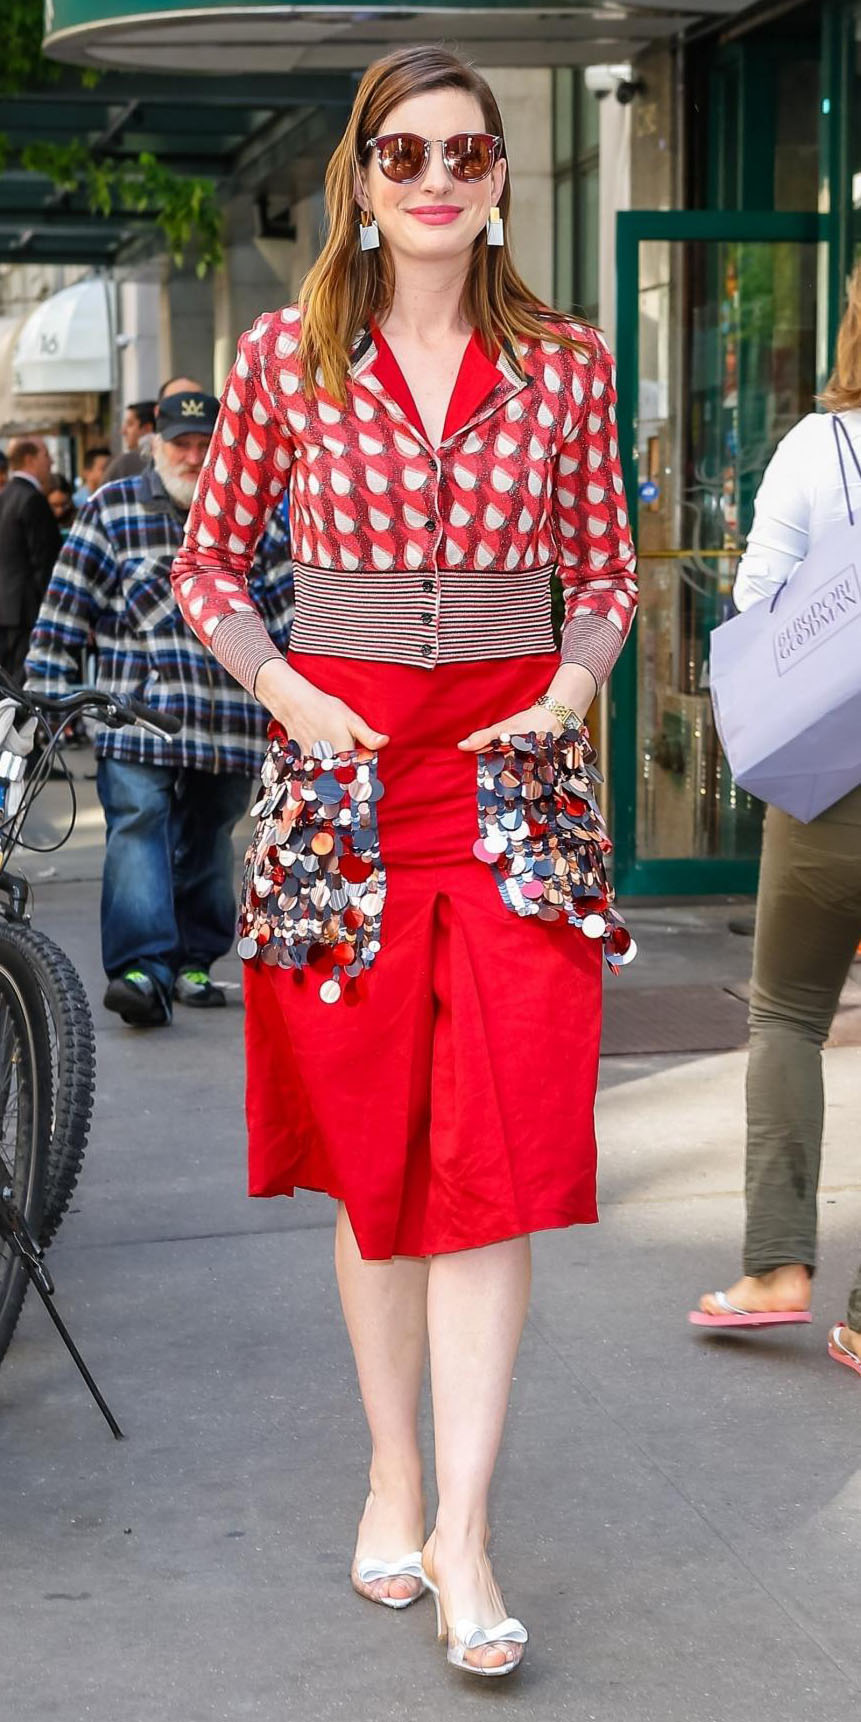 red-aline-skirt-red-cardigan-printed-earrings-hairr-sun-white-shoe-pumps-annehathaway-spring-summer-lunch.jpg